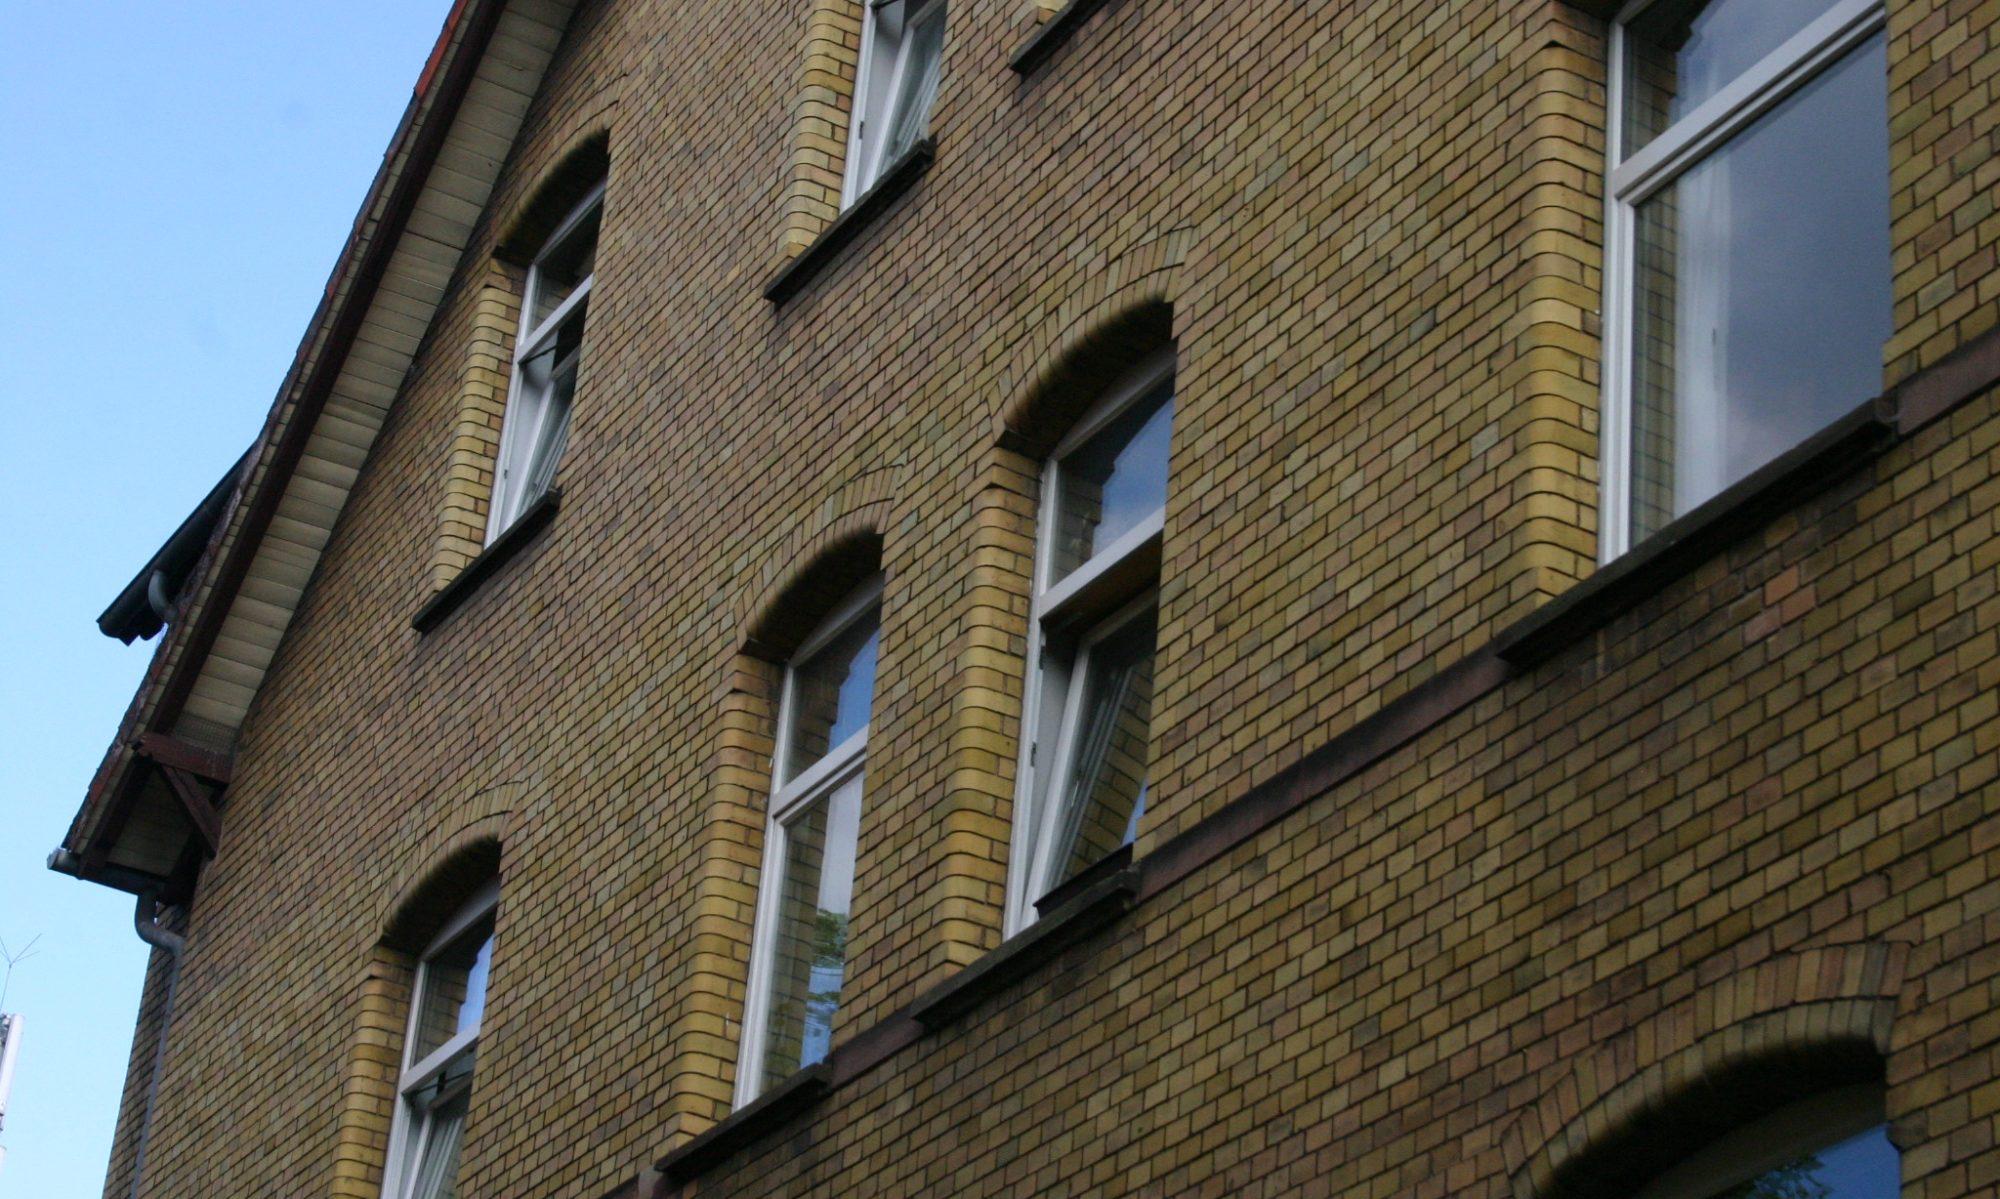 Hausprojekt GO17 - Gosslerstrasse 17/17a in Göttingen